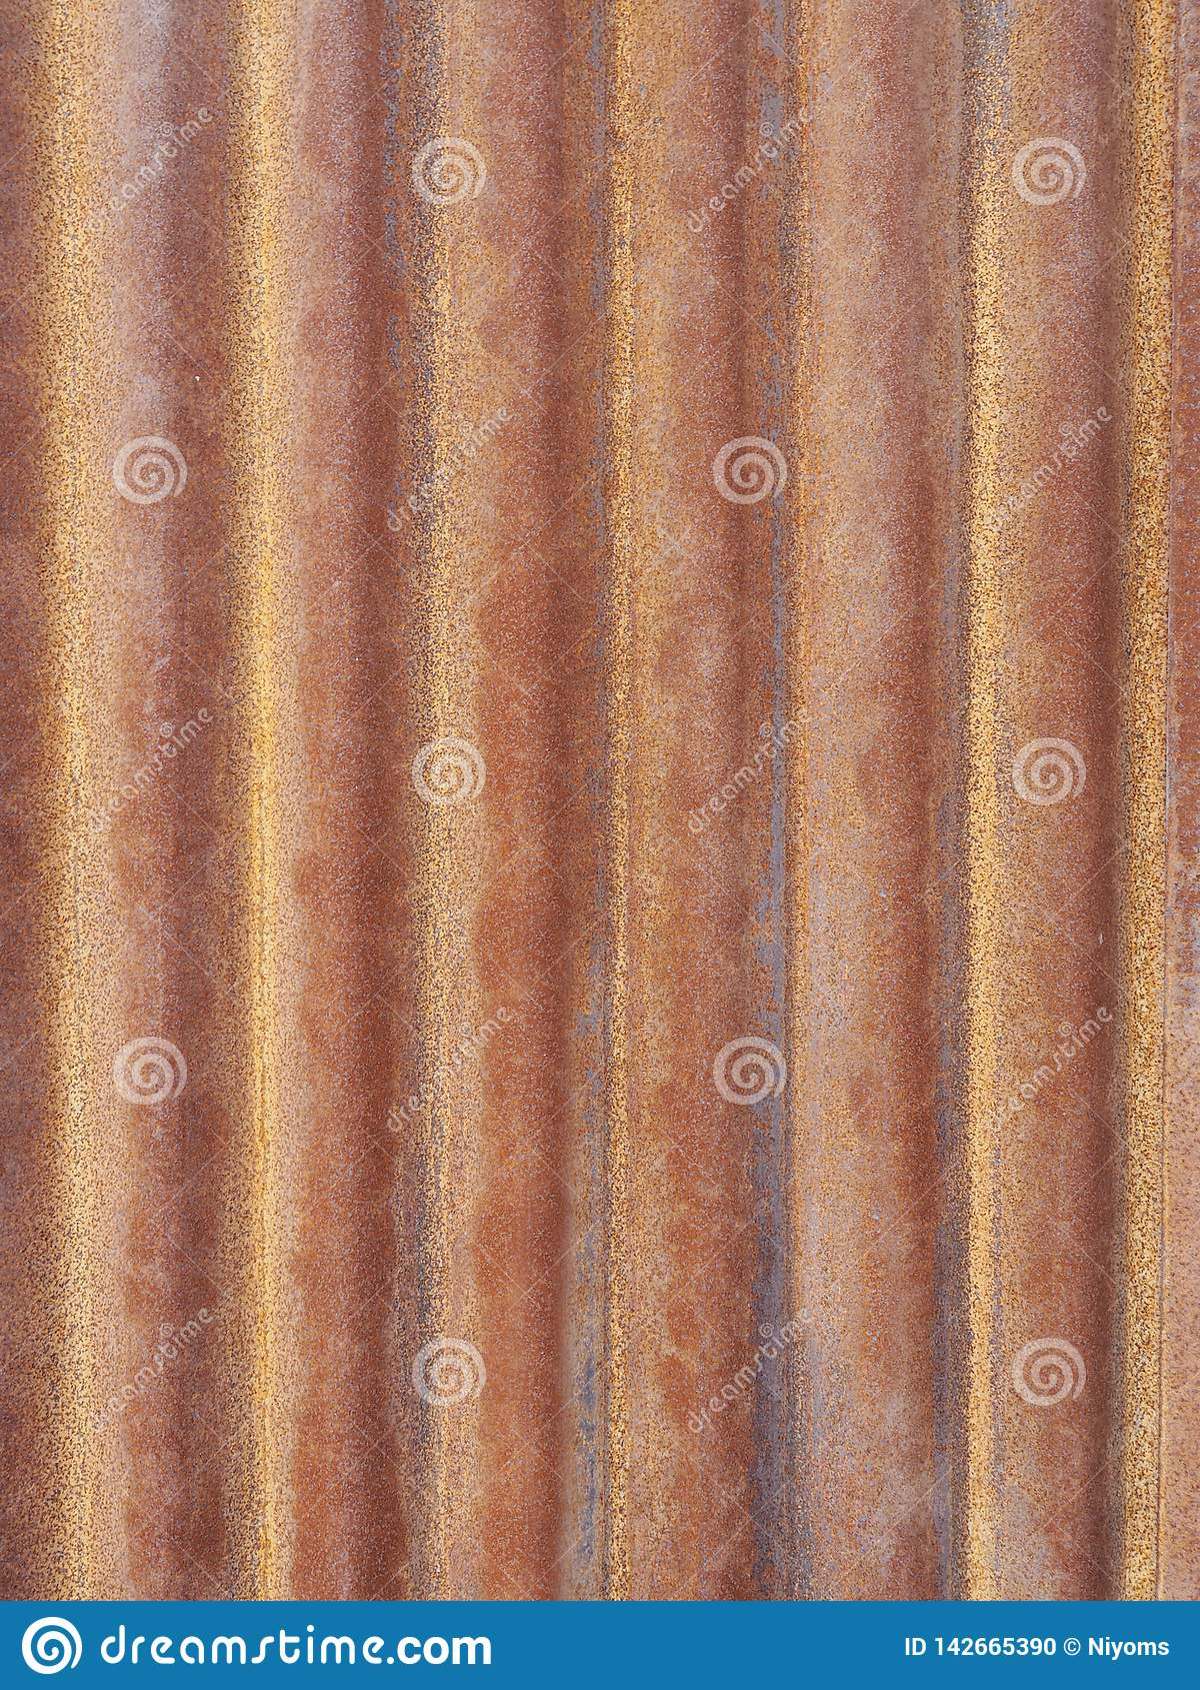 Заржаветая предпосылка текстуры поверхности плиты цинка